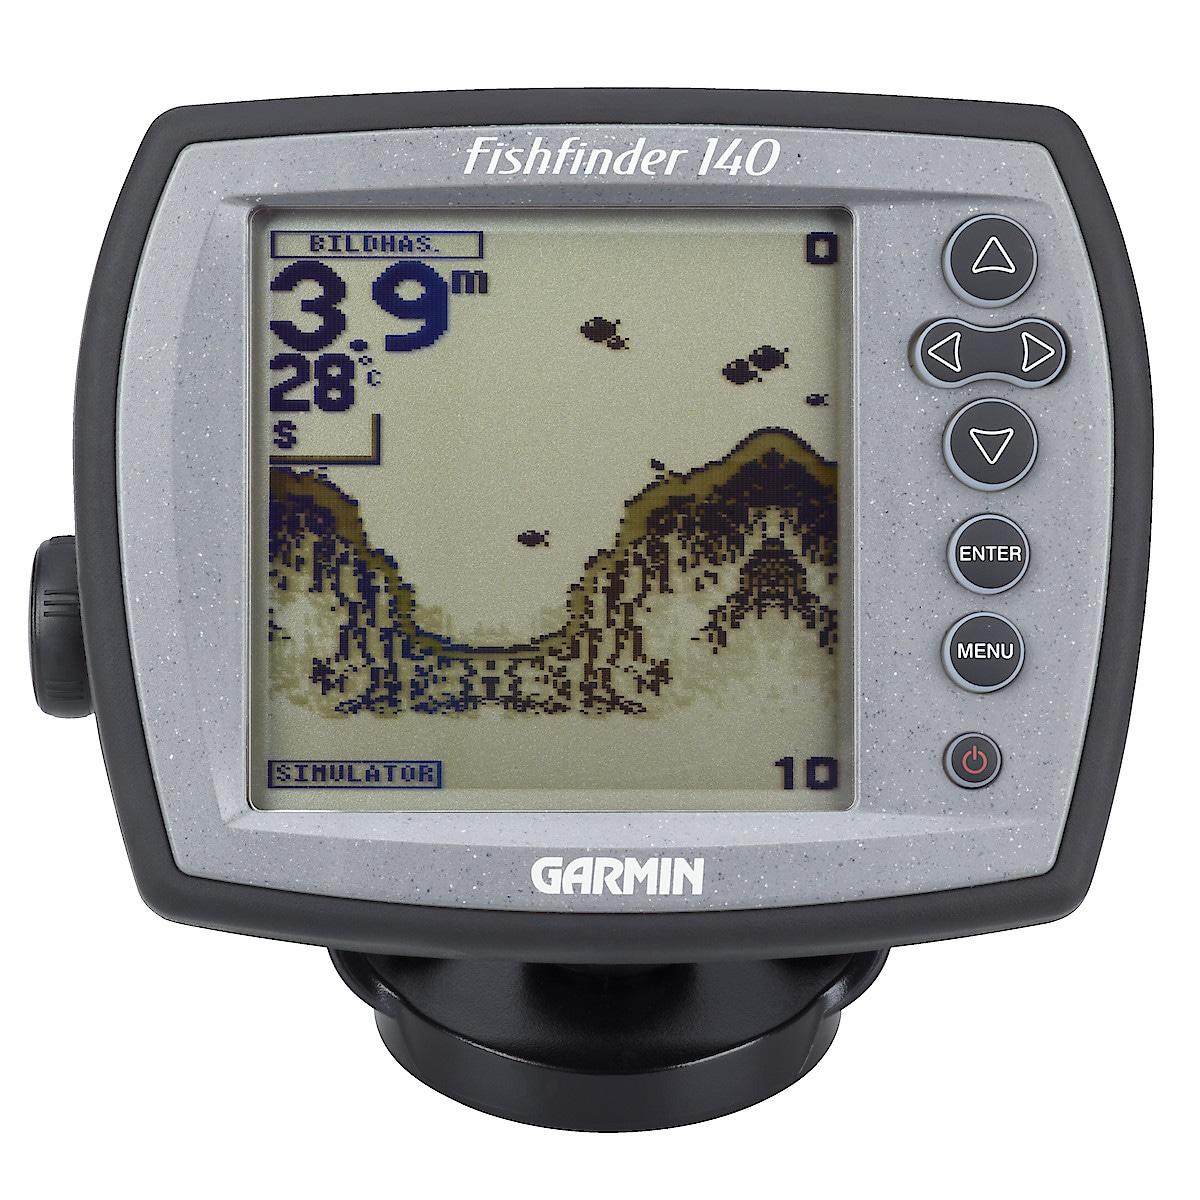 Ekolod Garmin Fishfinder 140